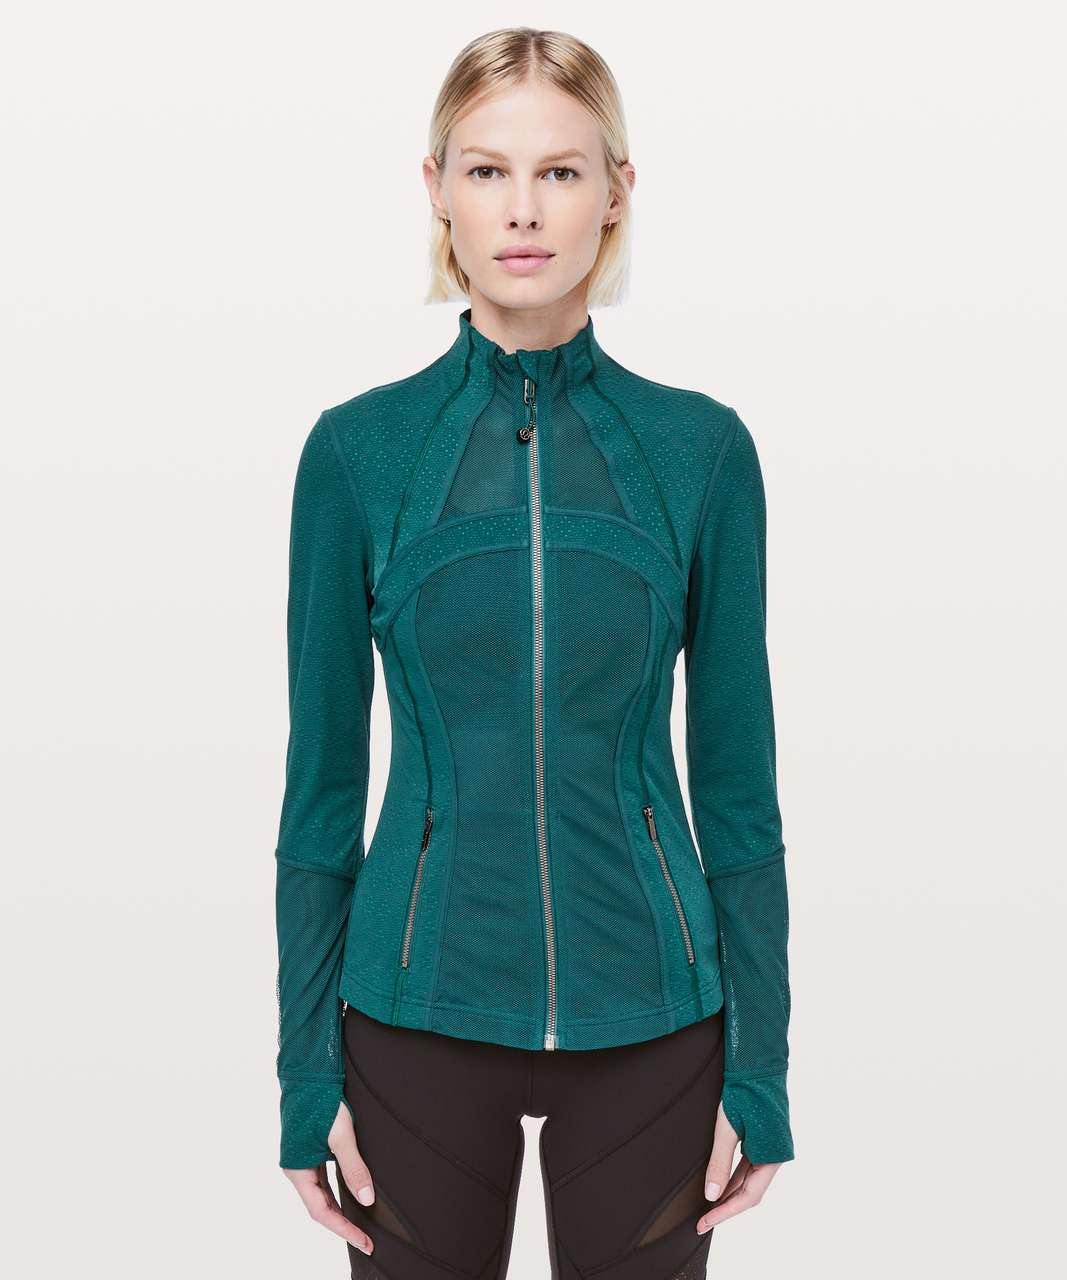 Lululemon Define Jacket *Full Mesh - Emerald